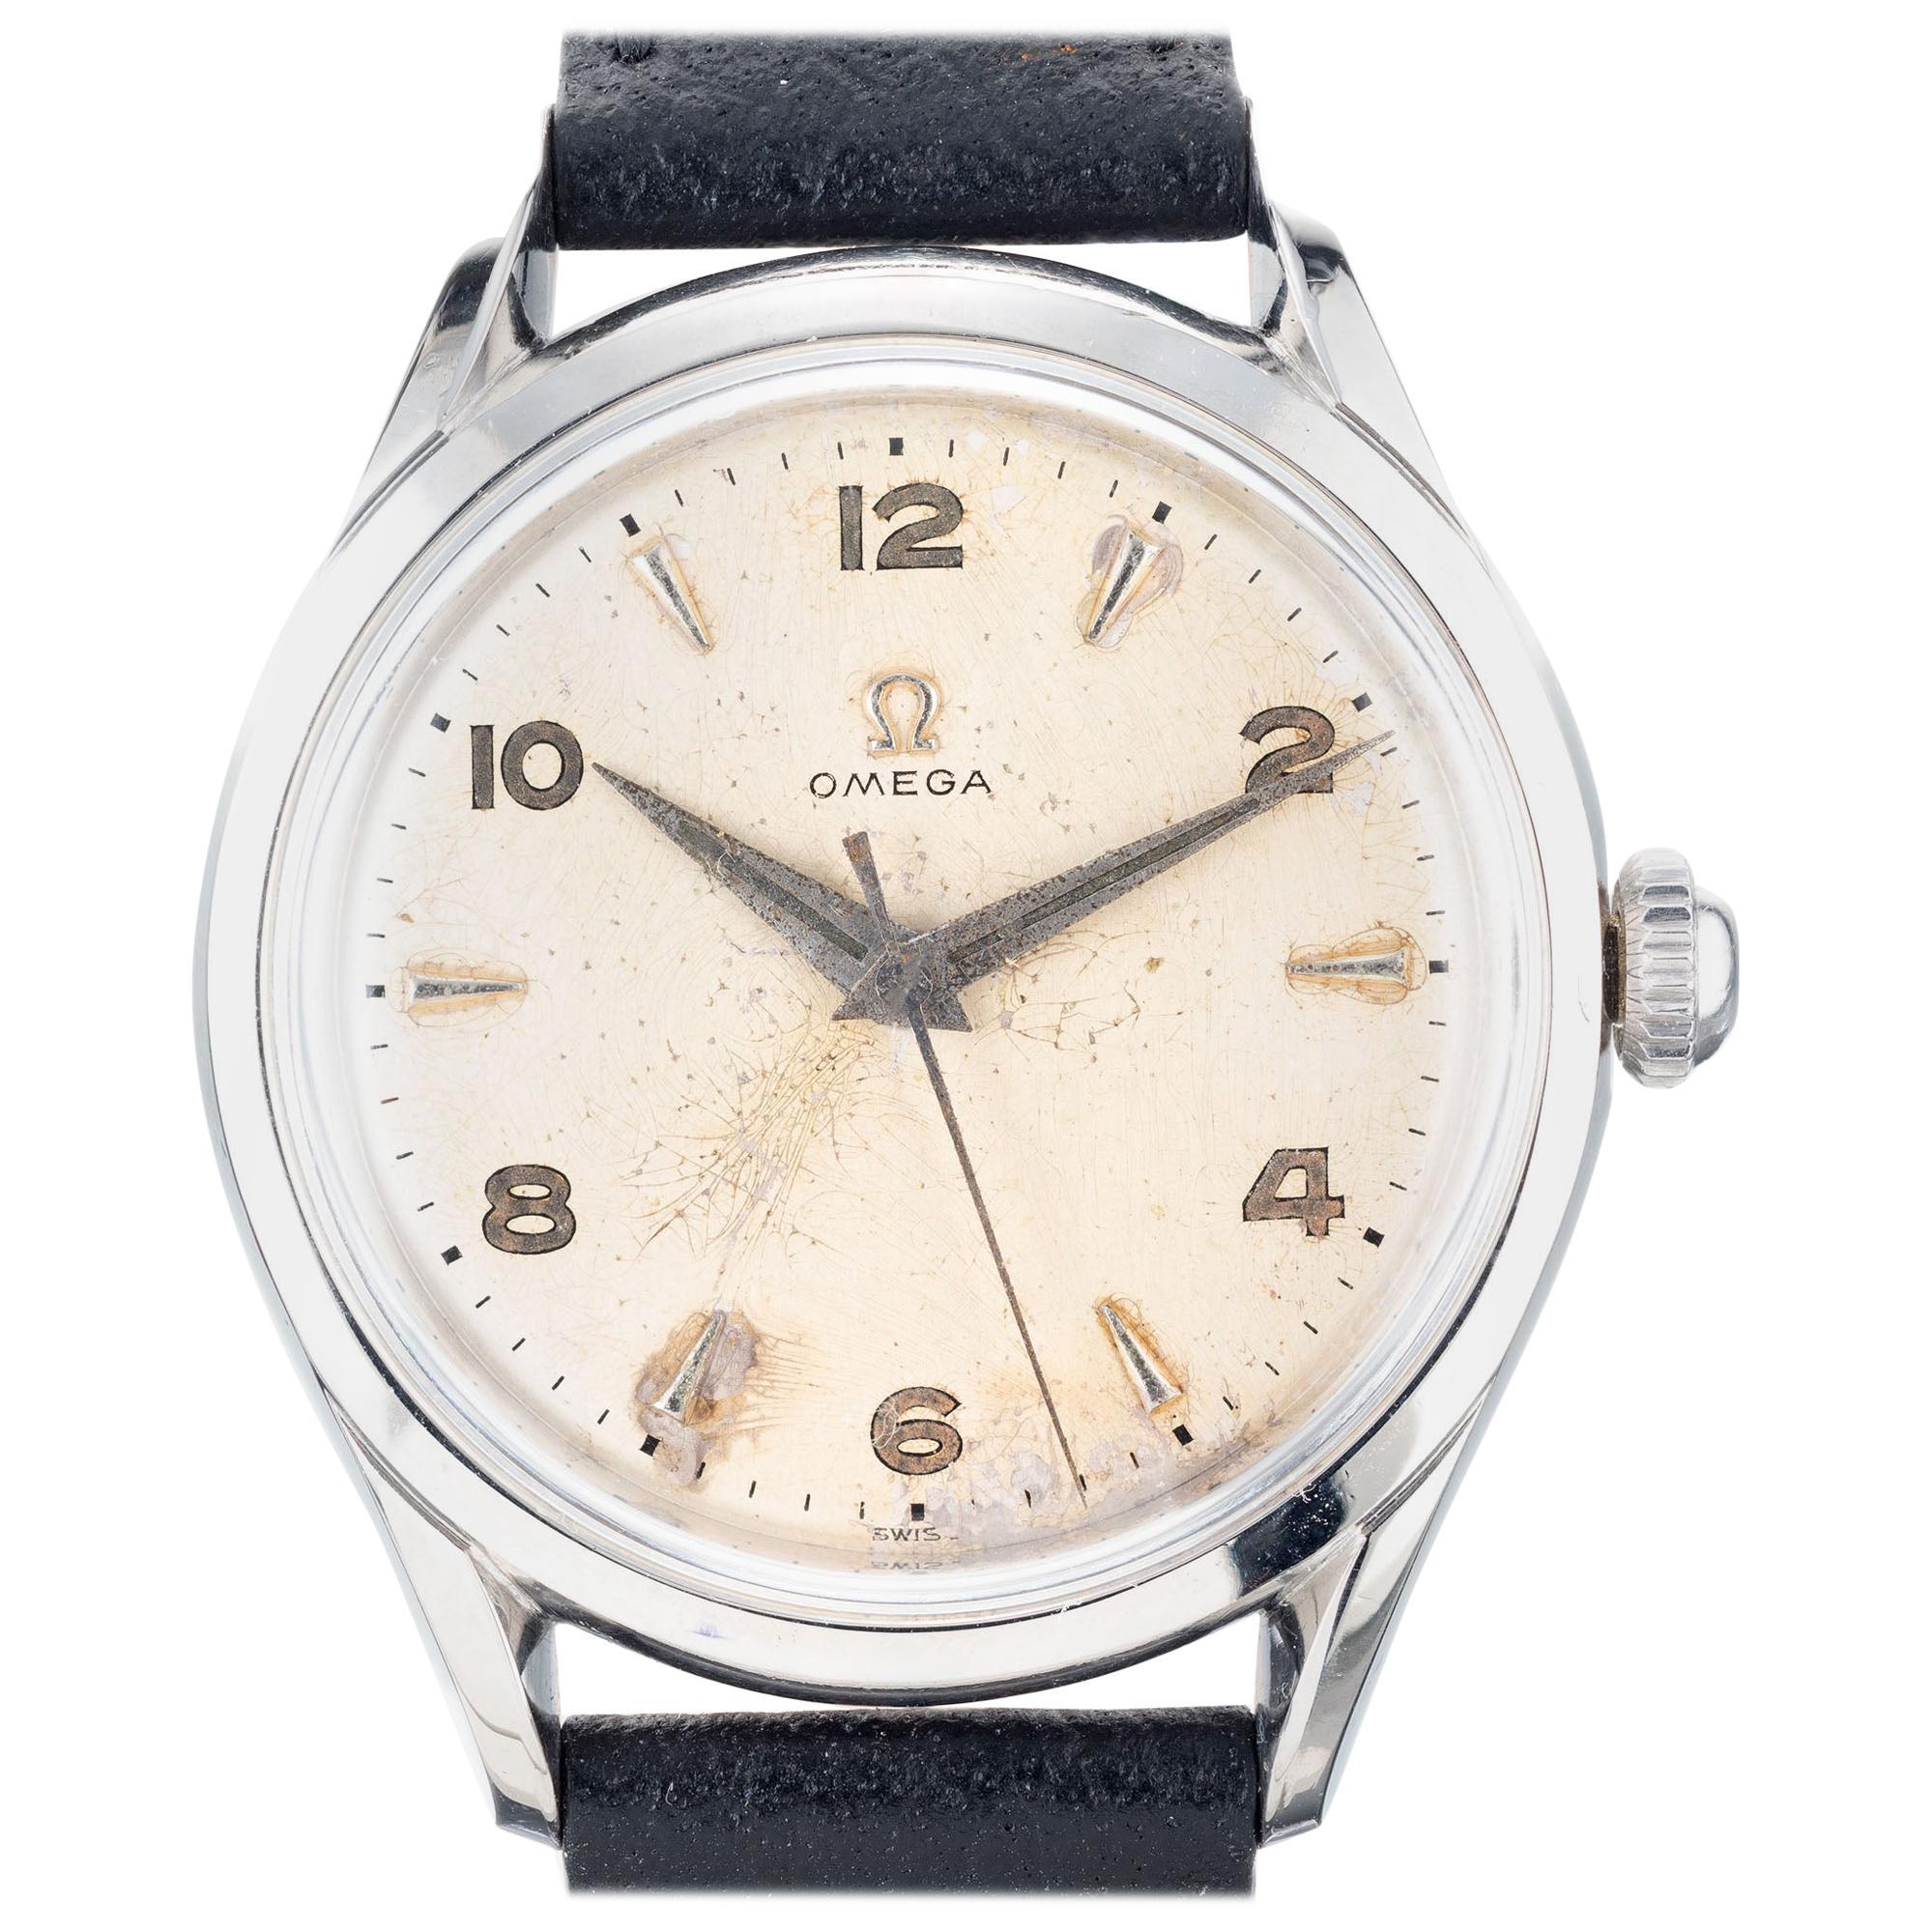 Omega Men's Stainless Steel Manual Wind Wristwatch